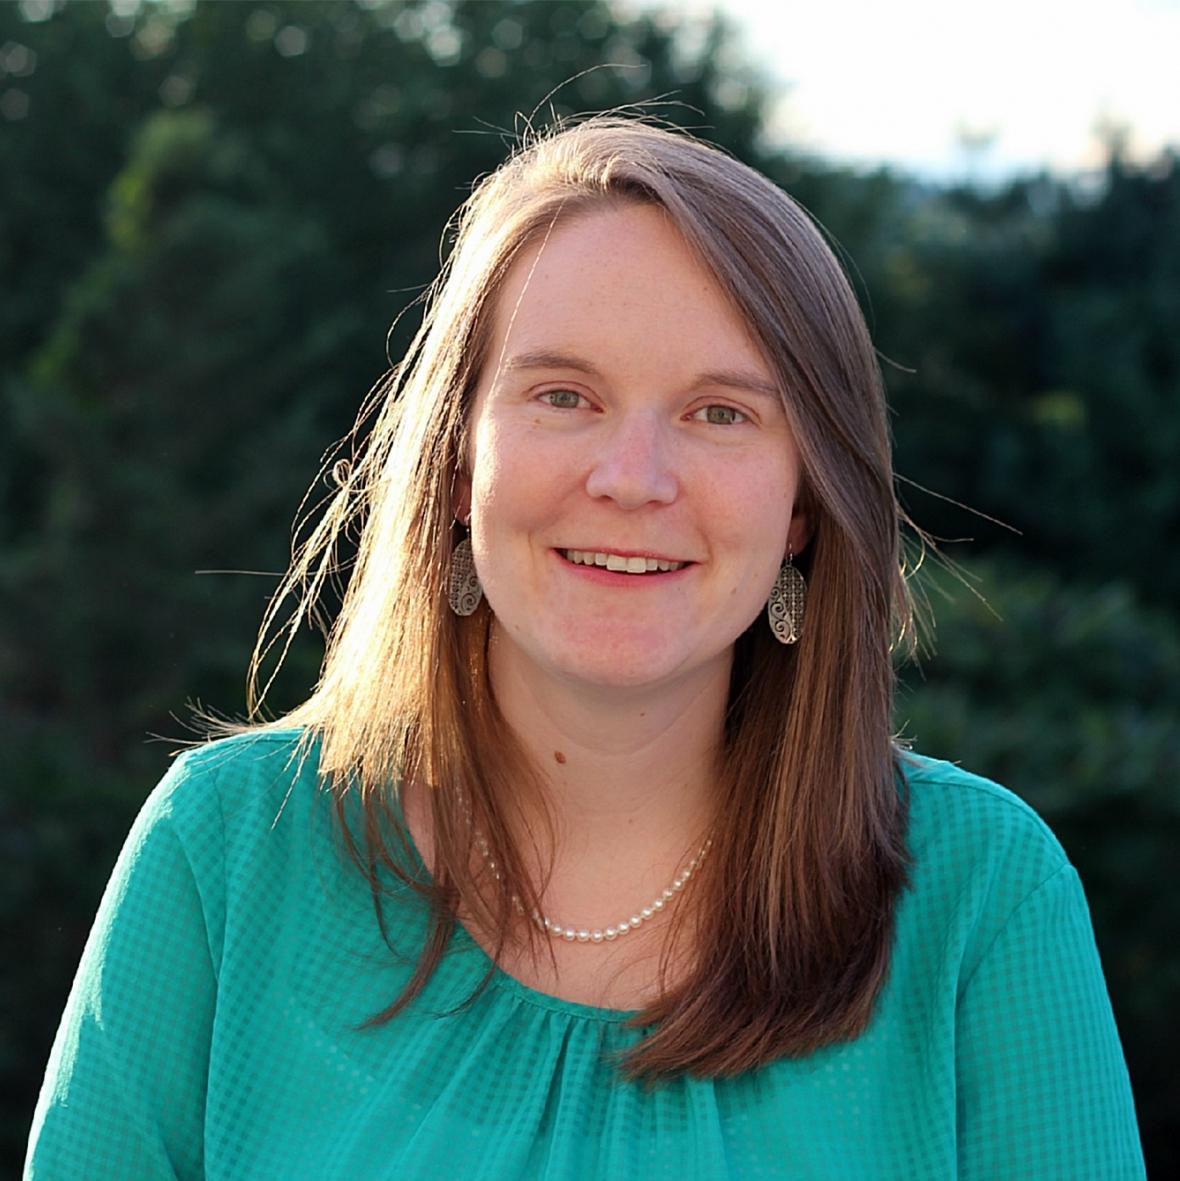 UMass Assistant Professor Kimberley Geissler